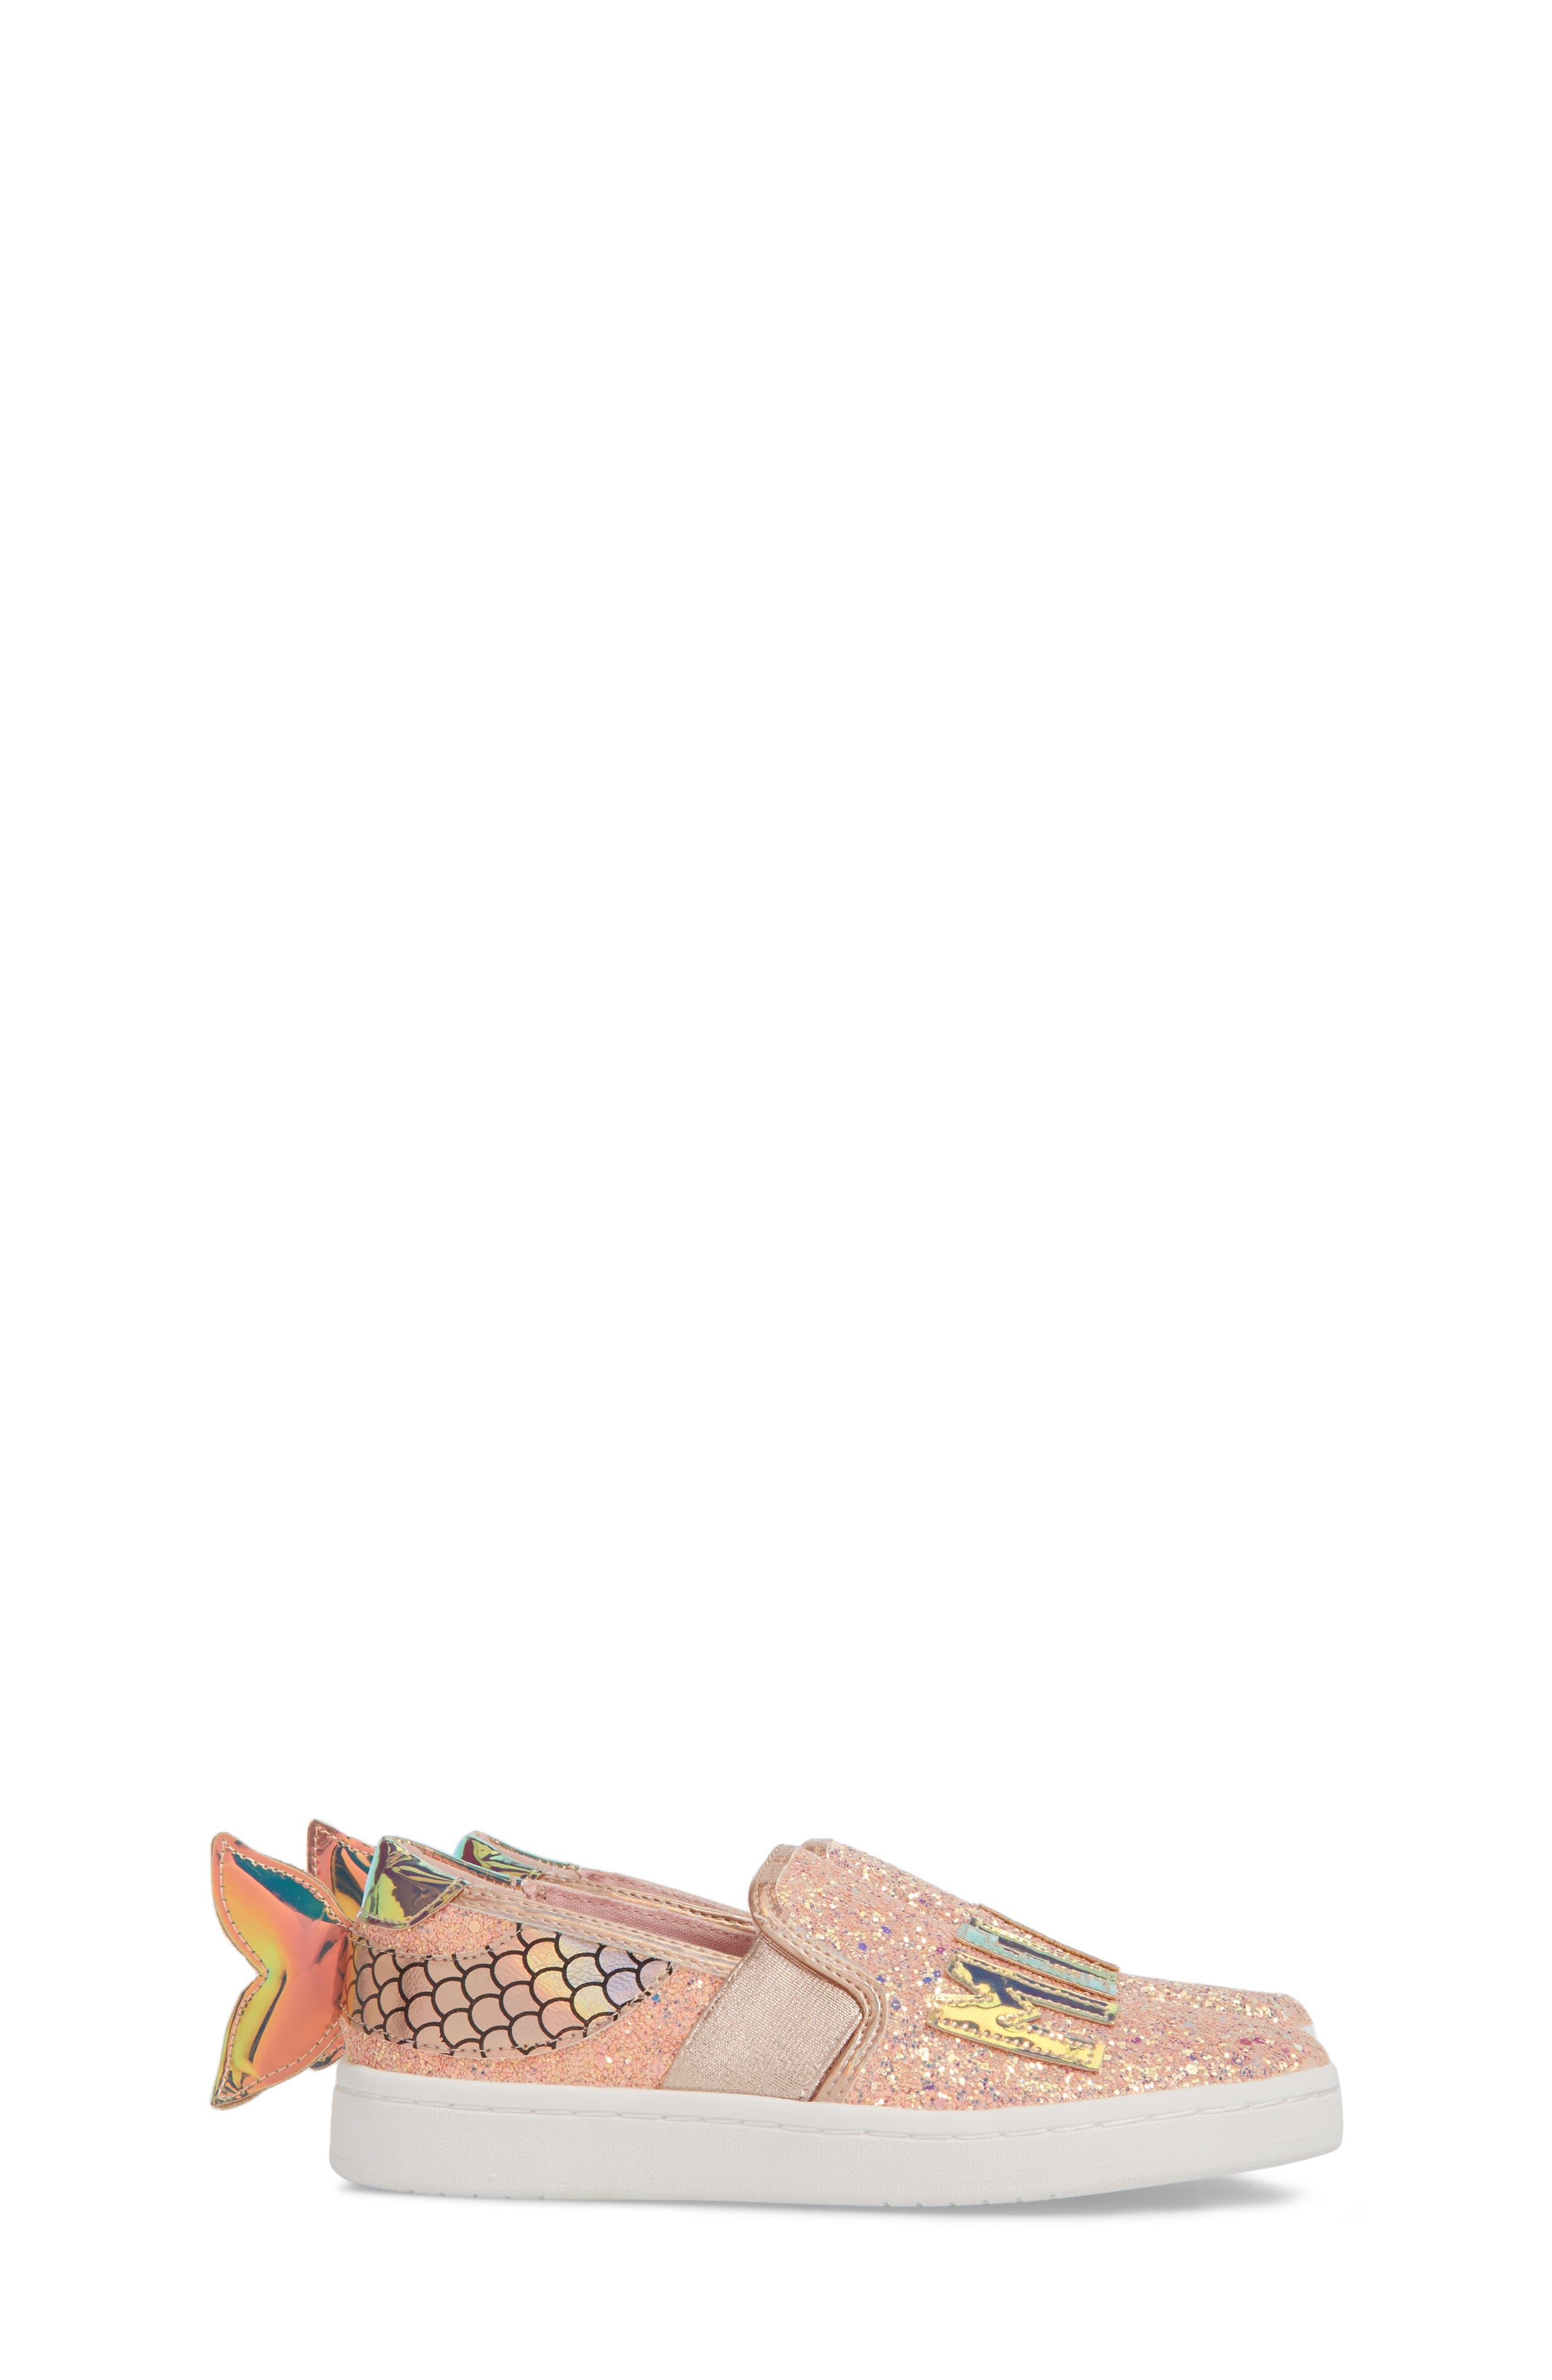 Blane Mermaid Sneaker,                             Alternate thumbnail 4, color,                             220